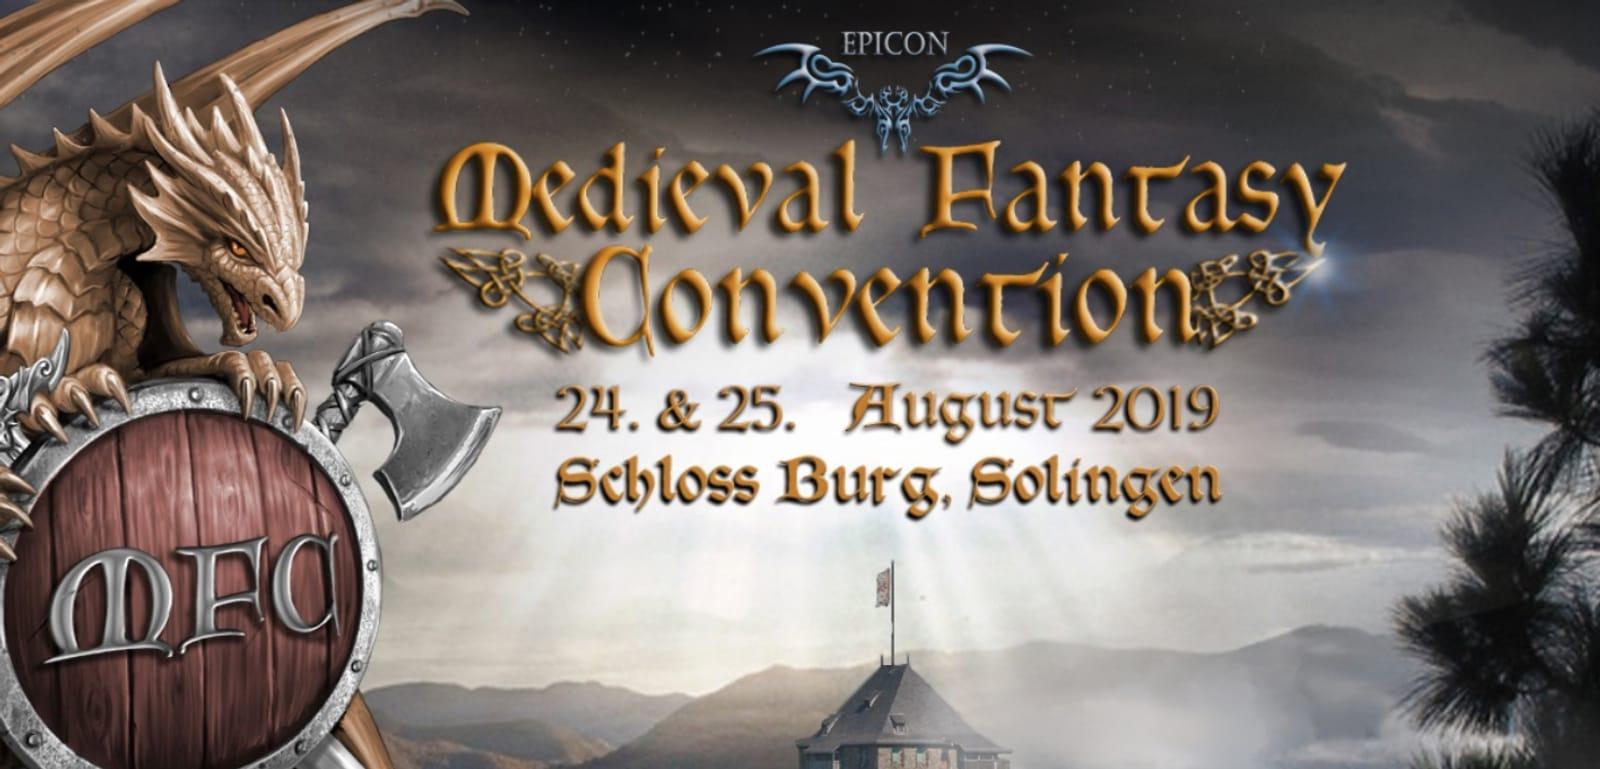 Medieval Fantasy Convention IV